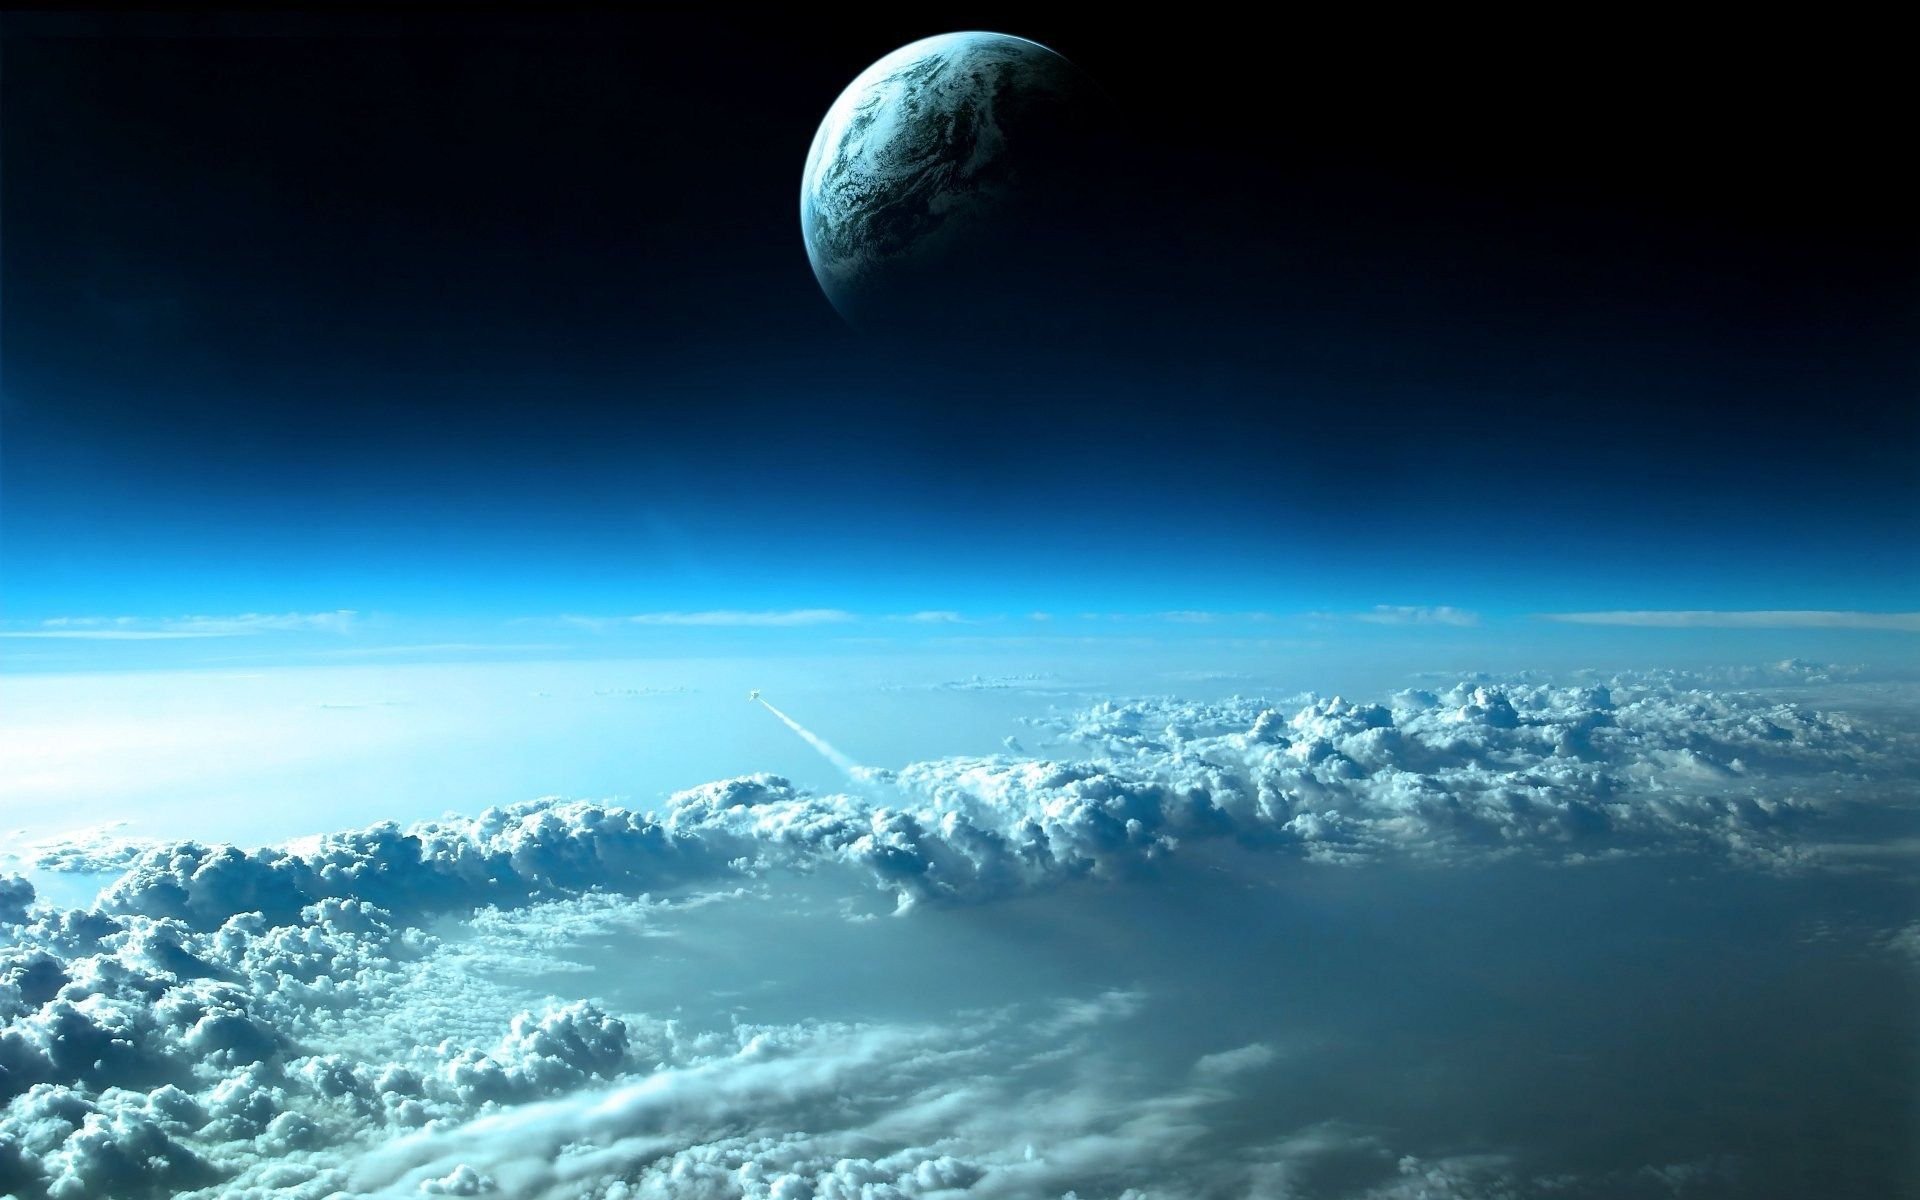 1920x1200 الغيوم خلفية الكواكب الفضاء الخارجي الأرض [1920x1200]